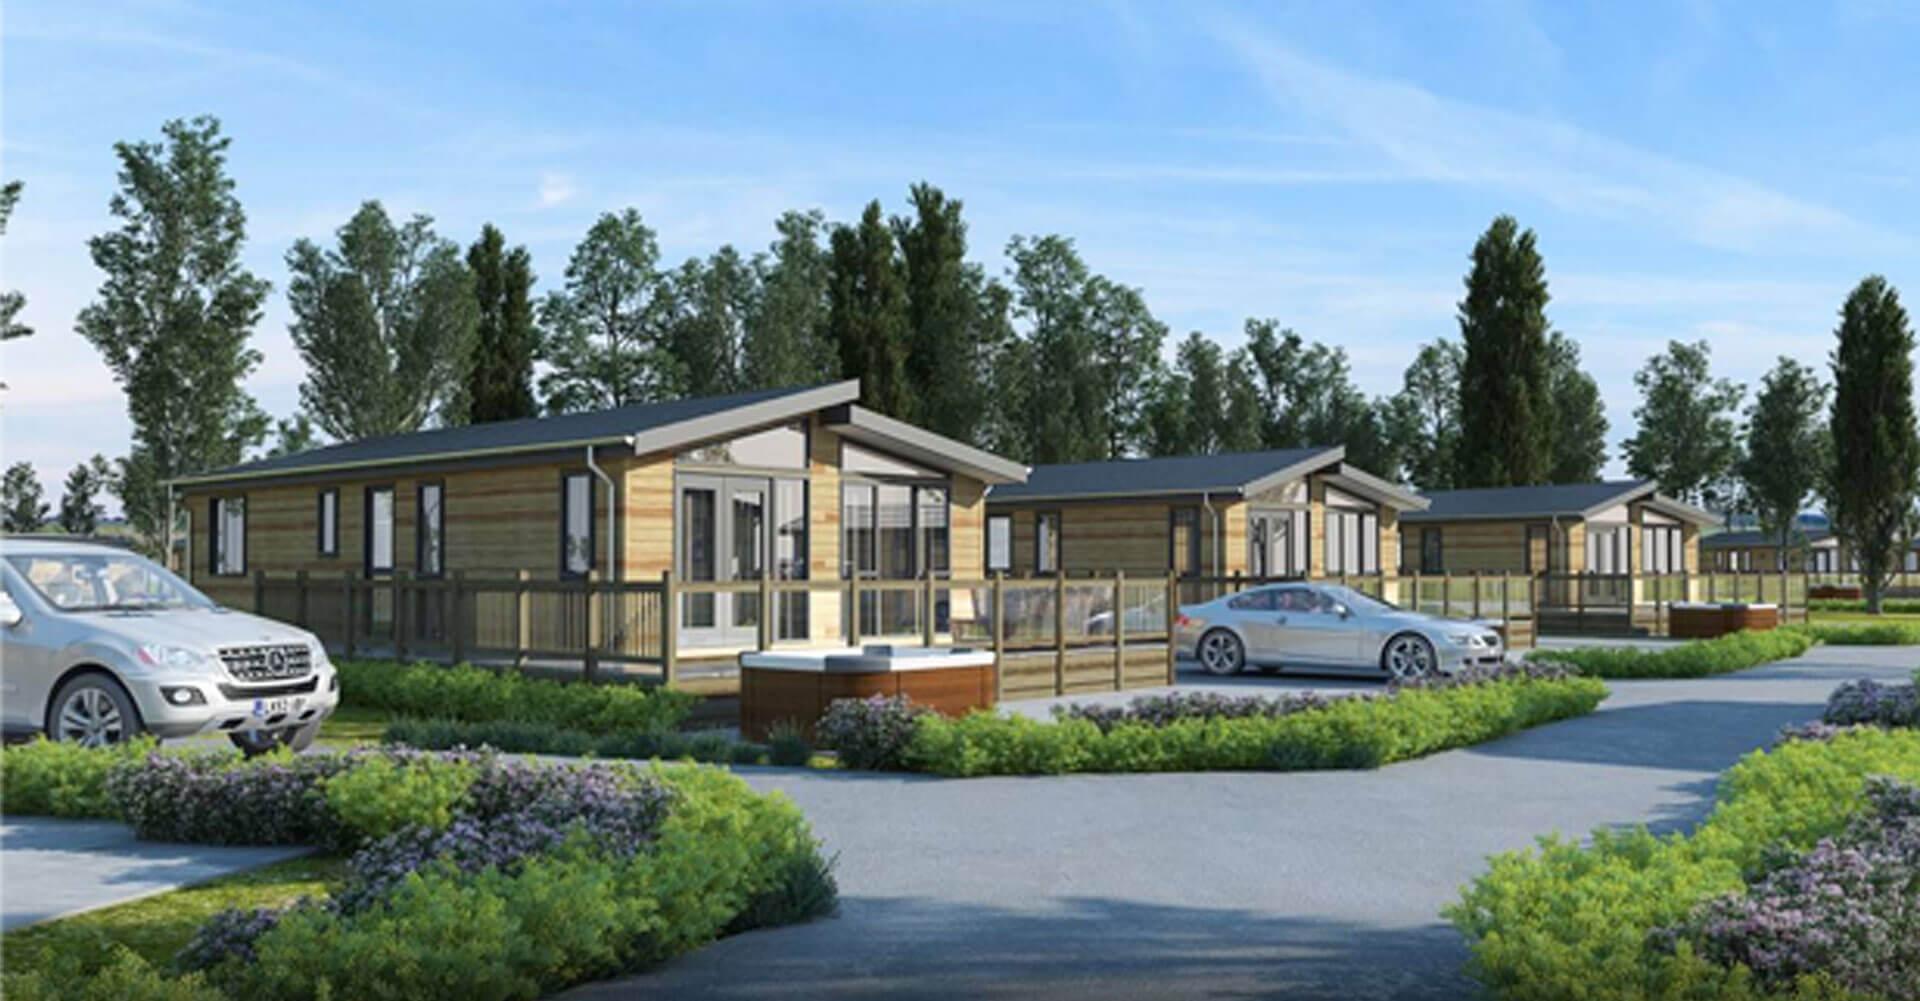 Luxury Lodge Group Holiday Lodges